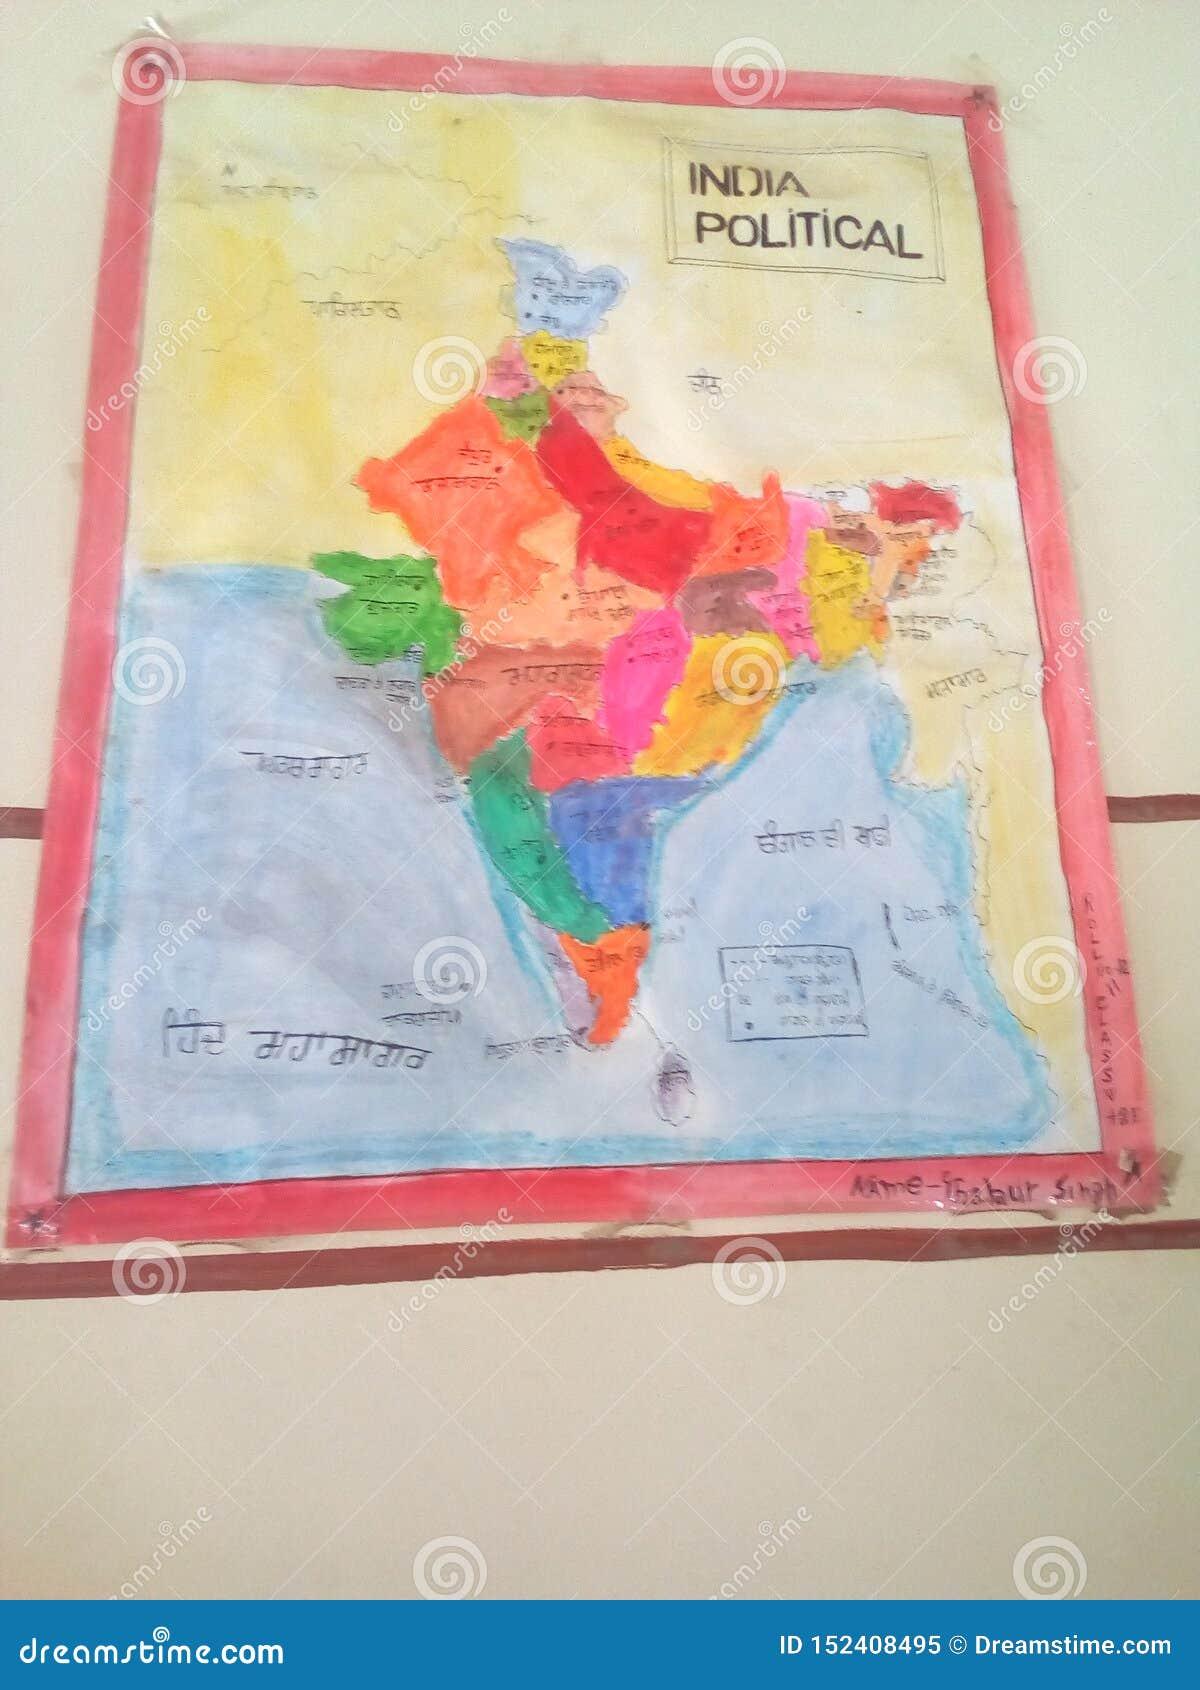 Work Map Indian Political Map Indian Political Editorial ...